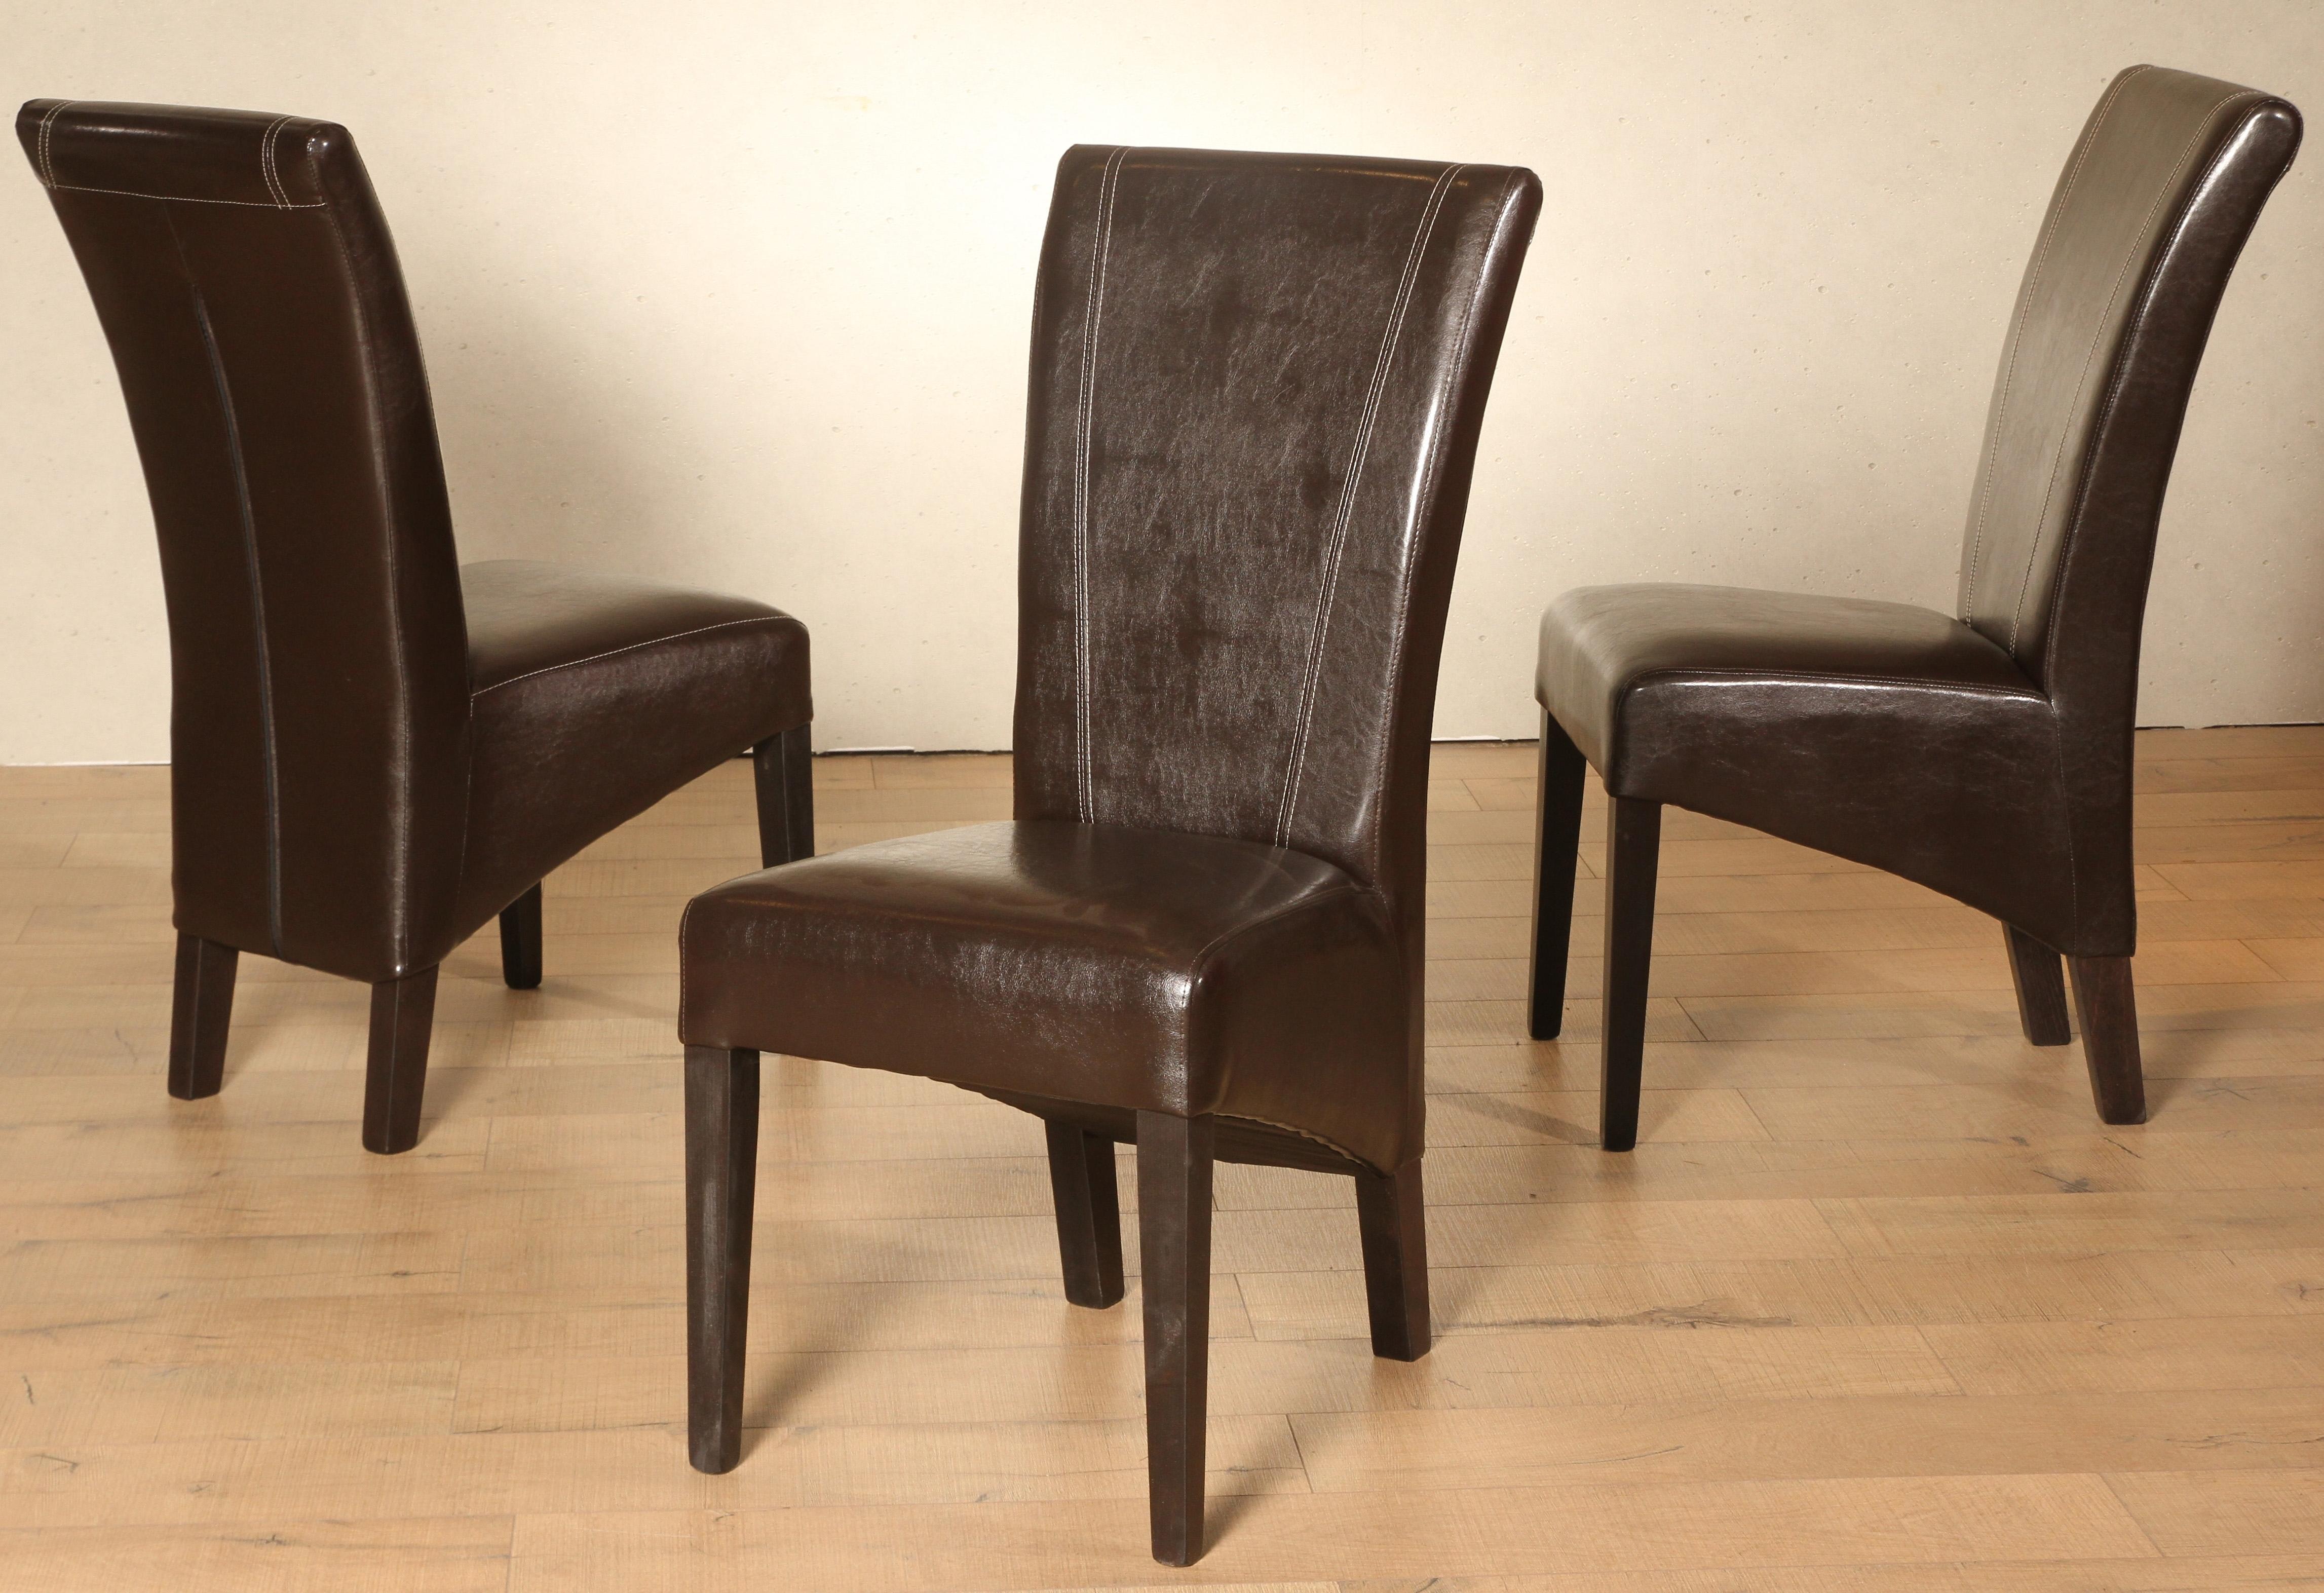 Premium collection by Home affaire stoel Lord (set) nu online bestellen